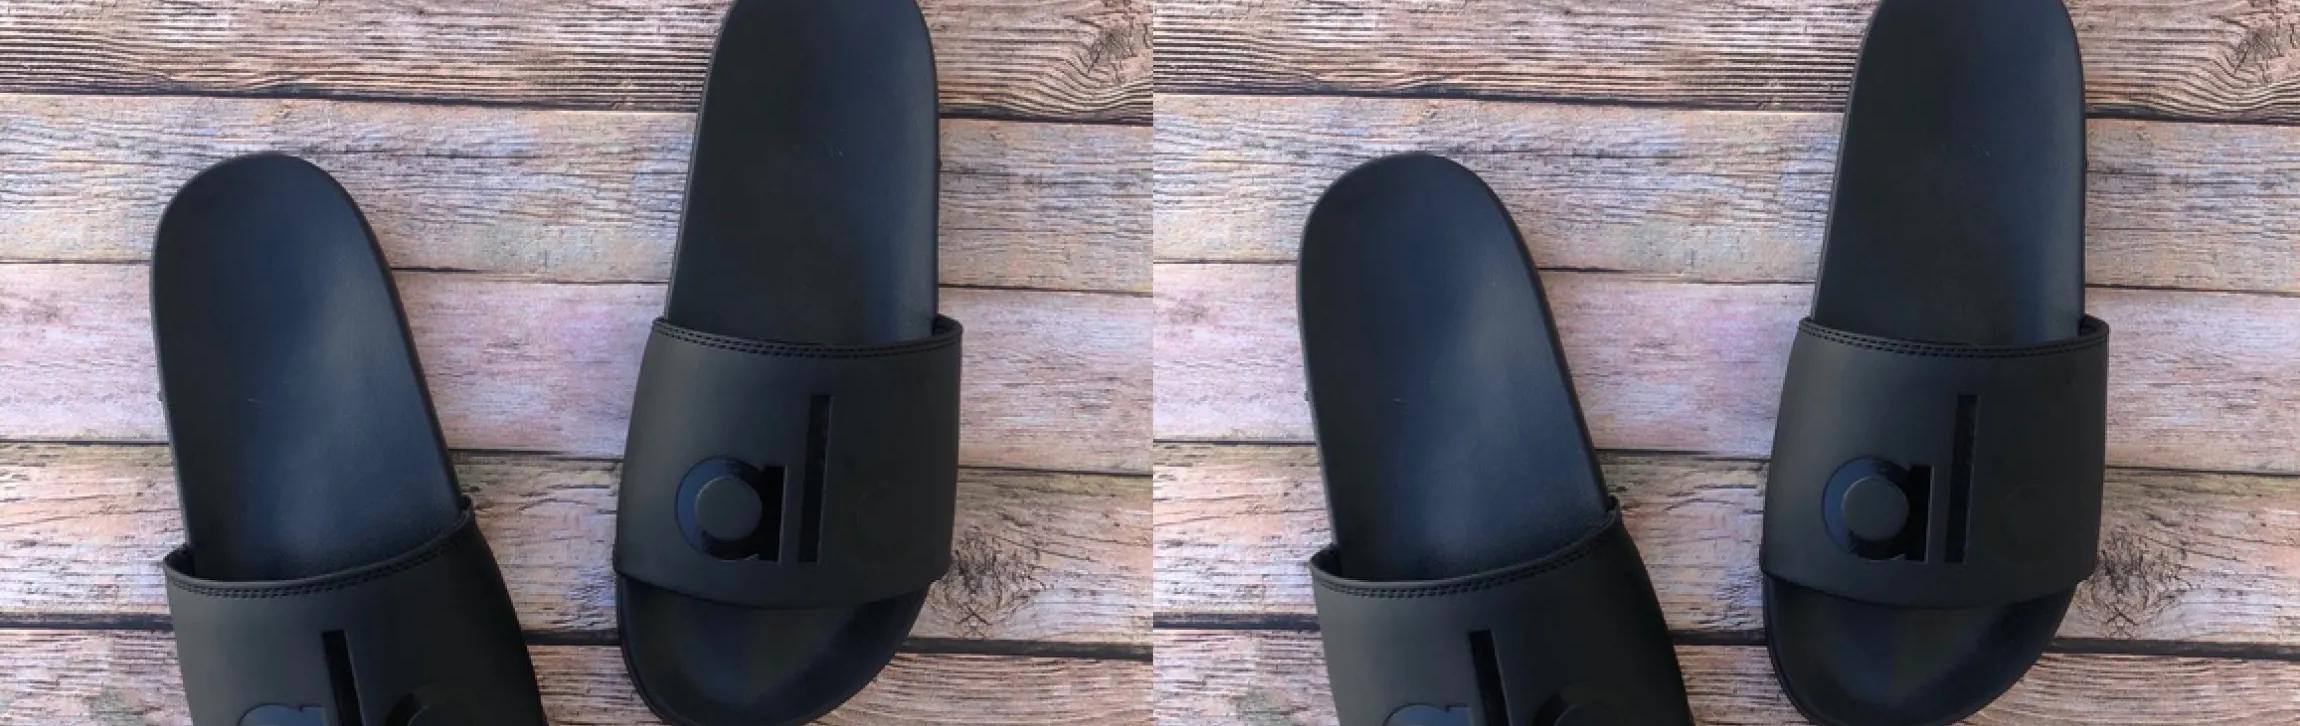 Shop Alo Yoga Shoes Slippers Online Summer